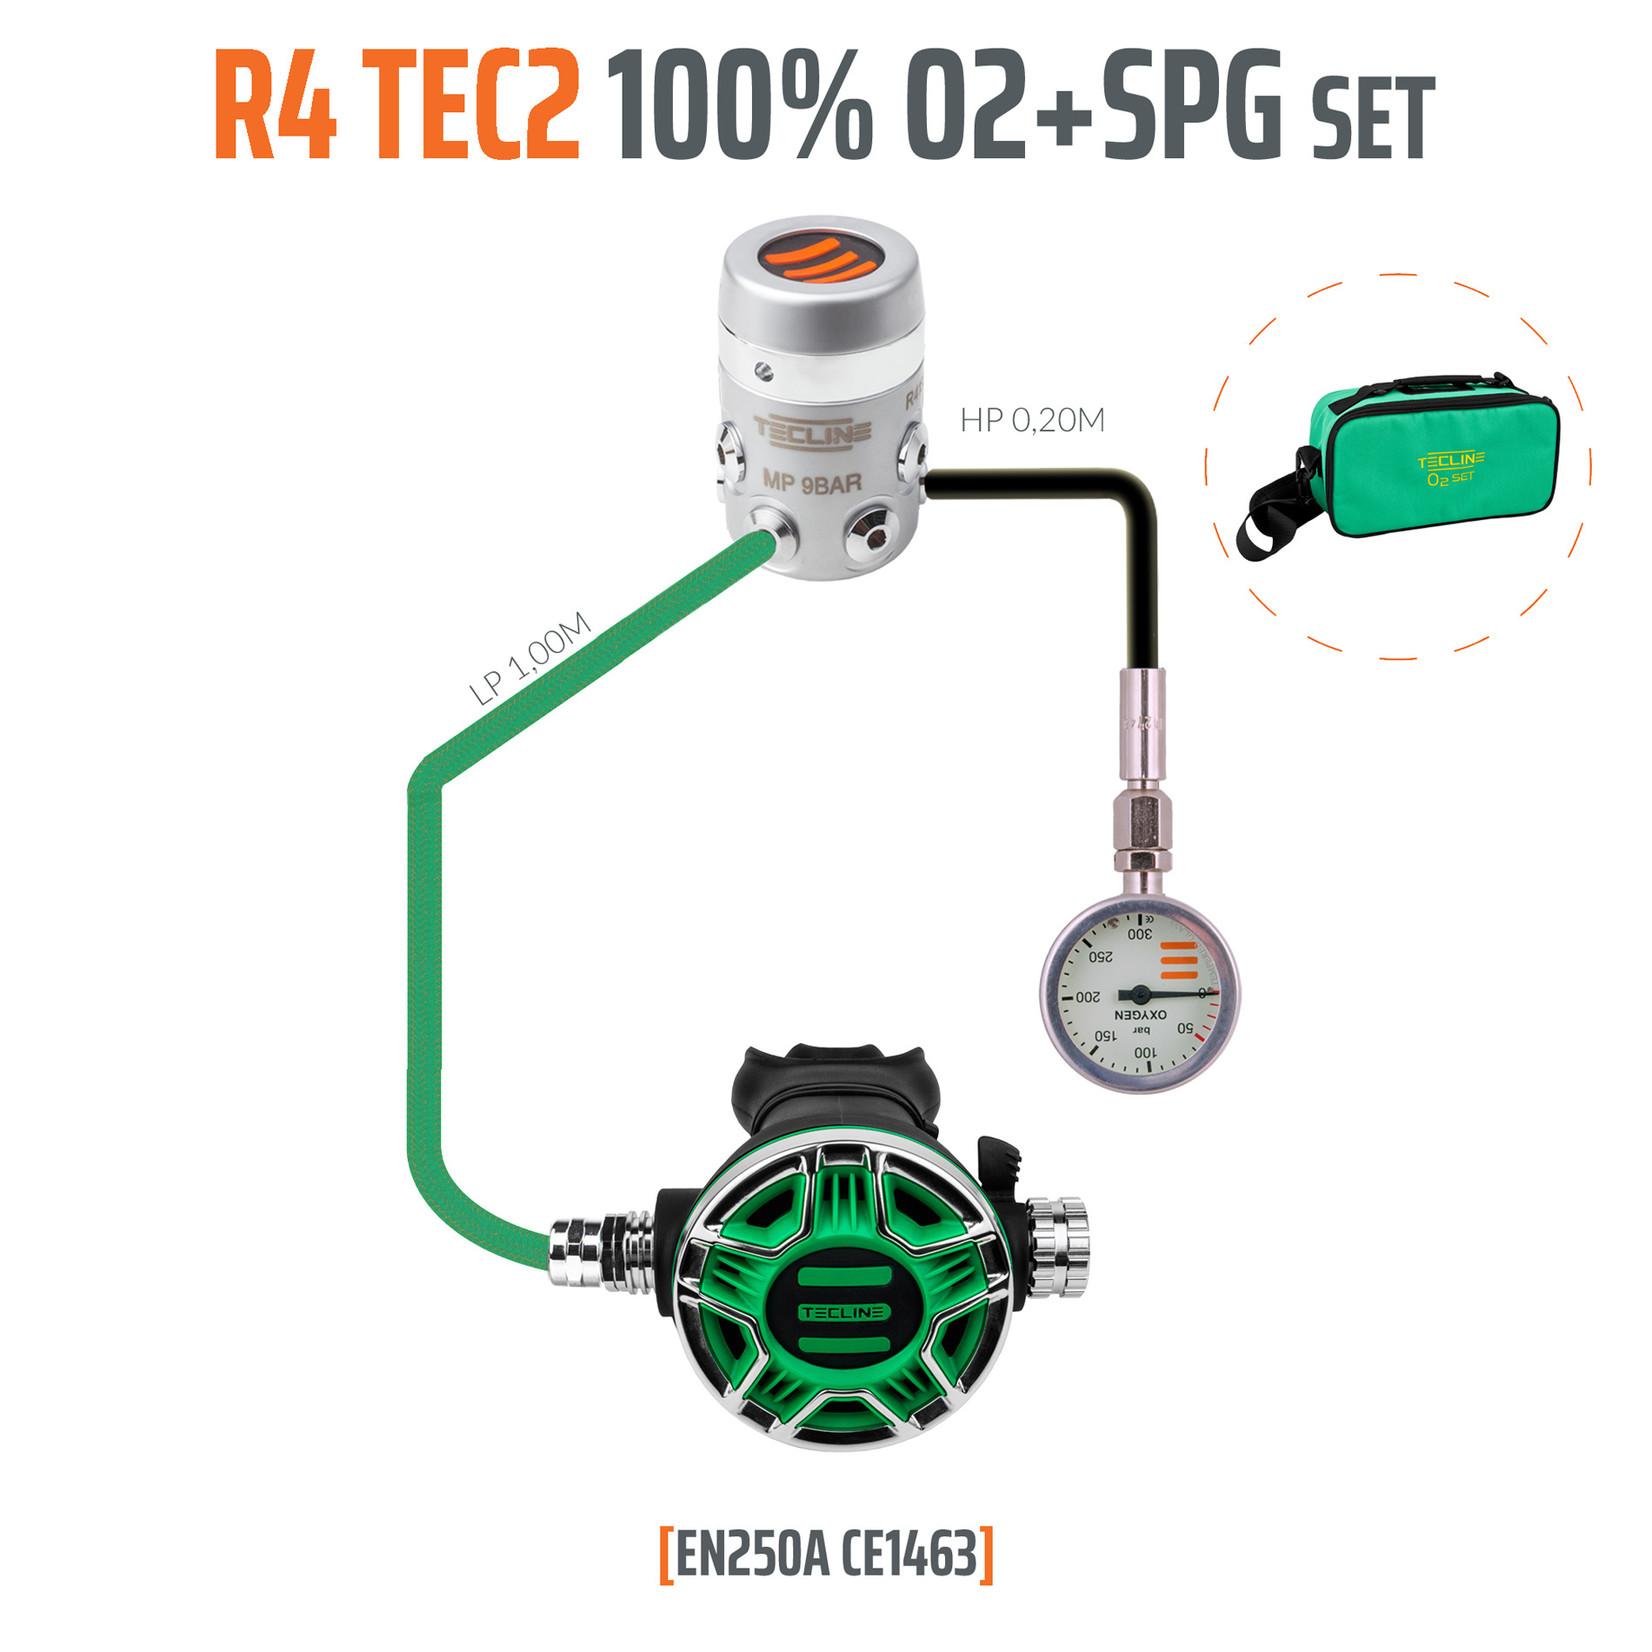 Tecline Regulator R4 TEC2 100% O2 M26x2 with SPG, stage set - EN250A